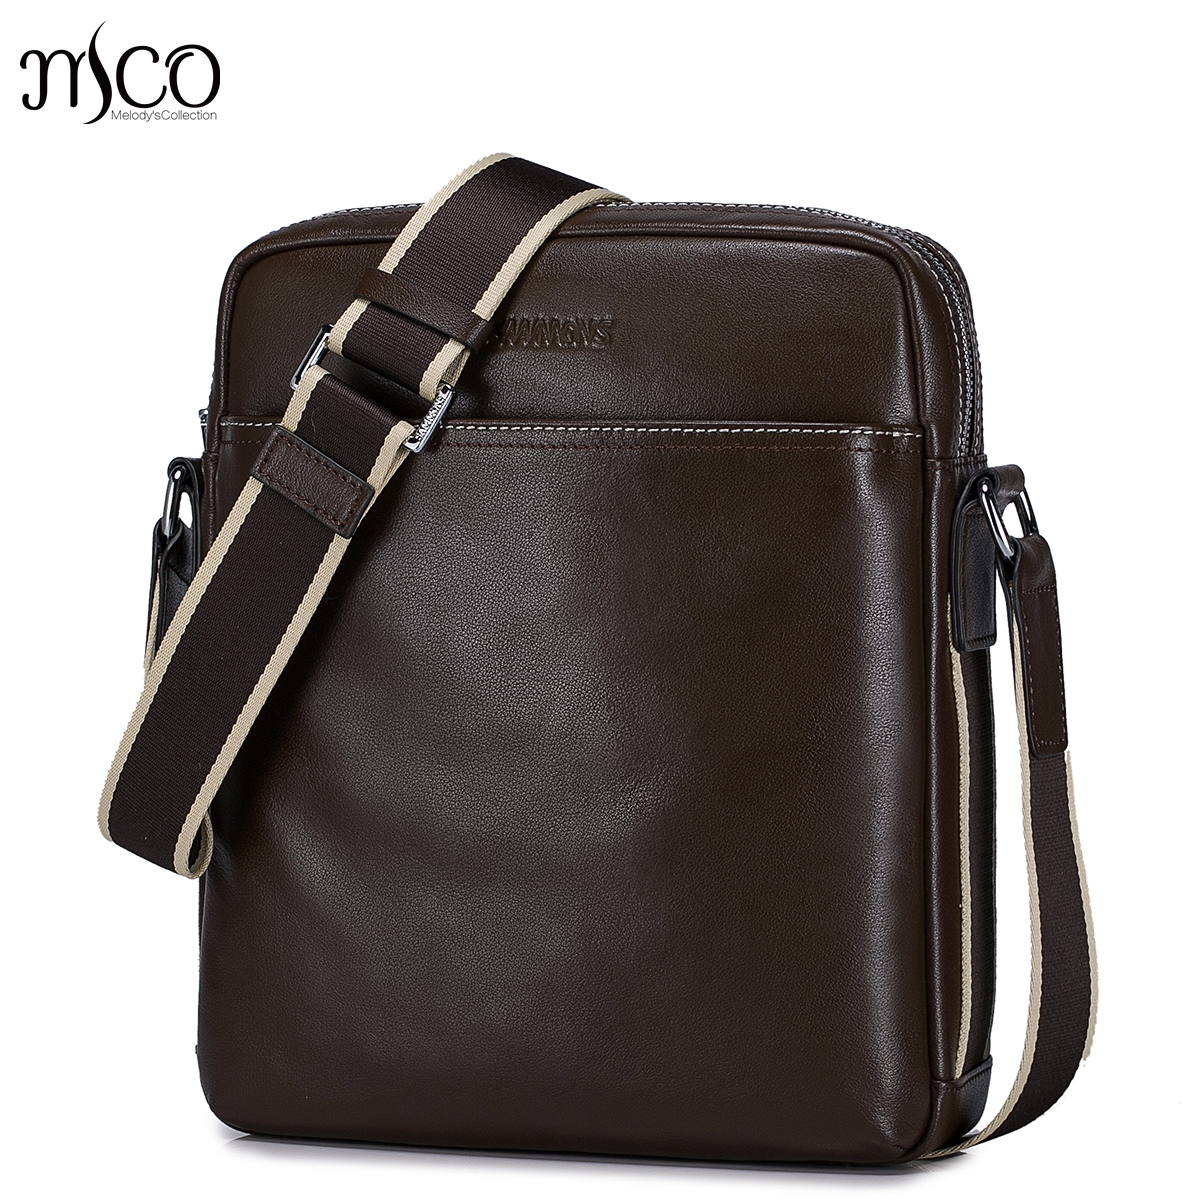 Luxury Men Bag Genuine Leather Business Male Crossbody Shoulder Messenger Bags Leisure Small Flap Bag цена 2017